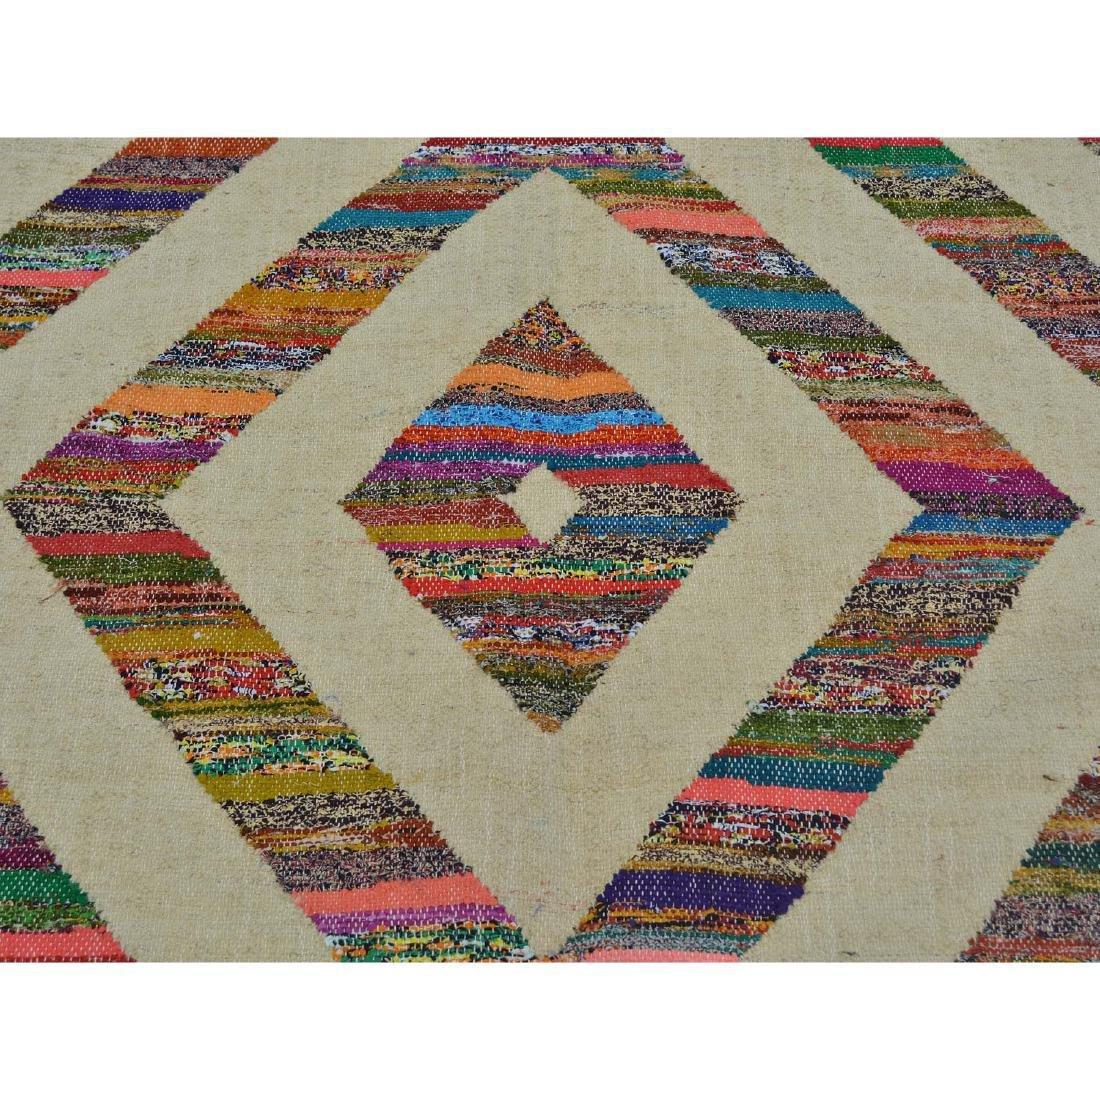 Weave Hand Woven Wool Sari Silk Durie Kilim Rug 9x11.10 - 4